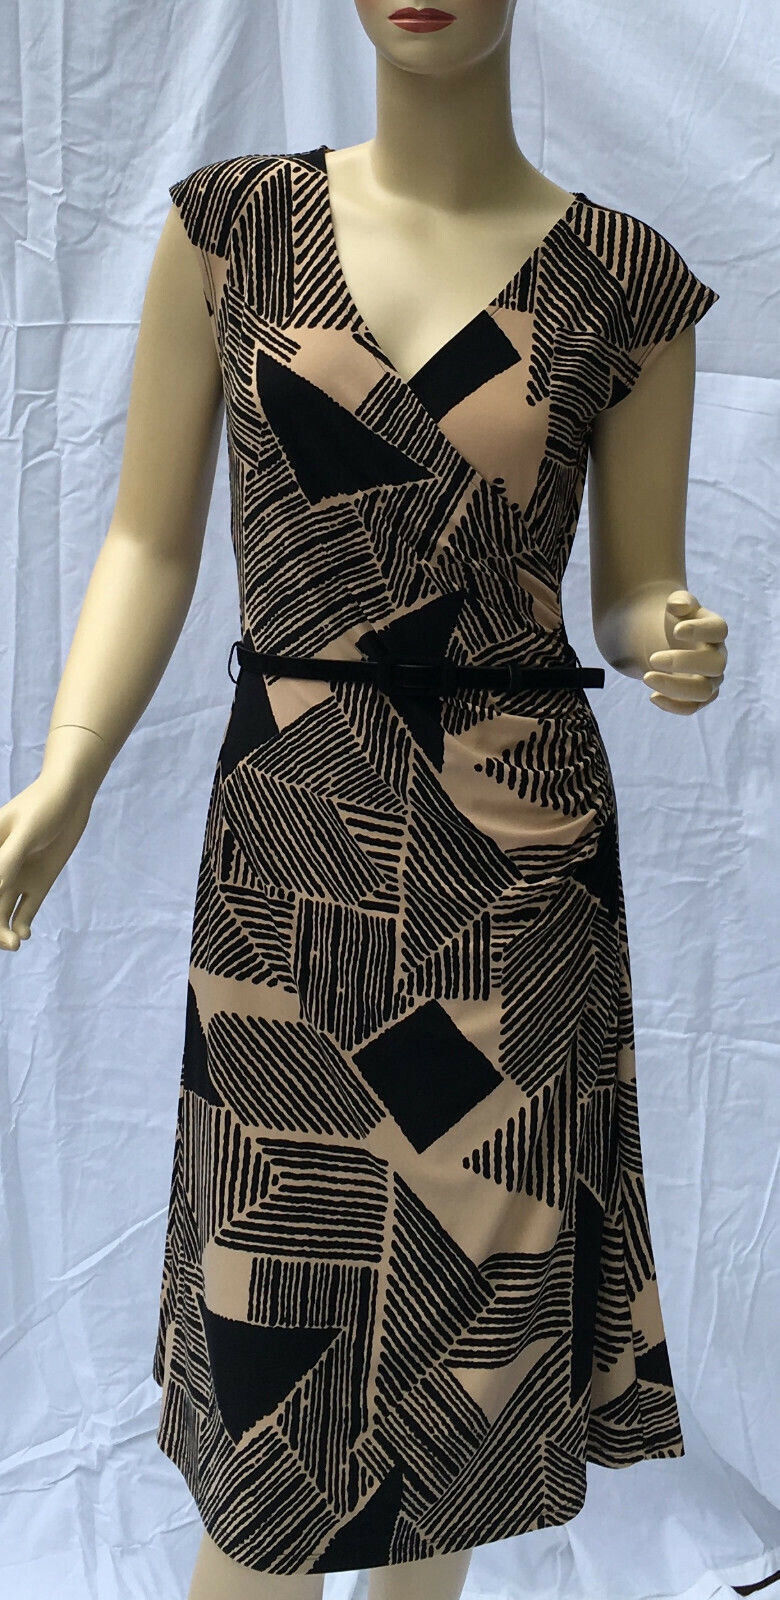 Ralph Lauren V-Neck Dress Medium schwarz Tan Geometric Belted Cruise Party